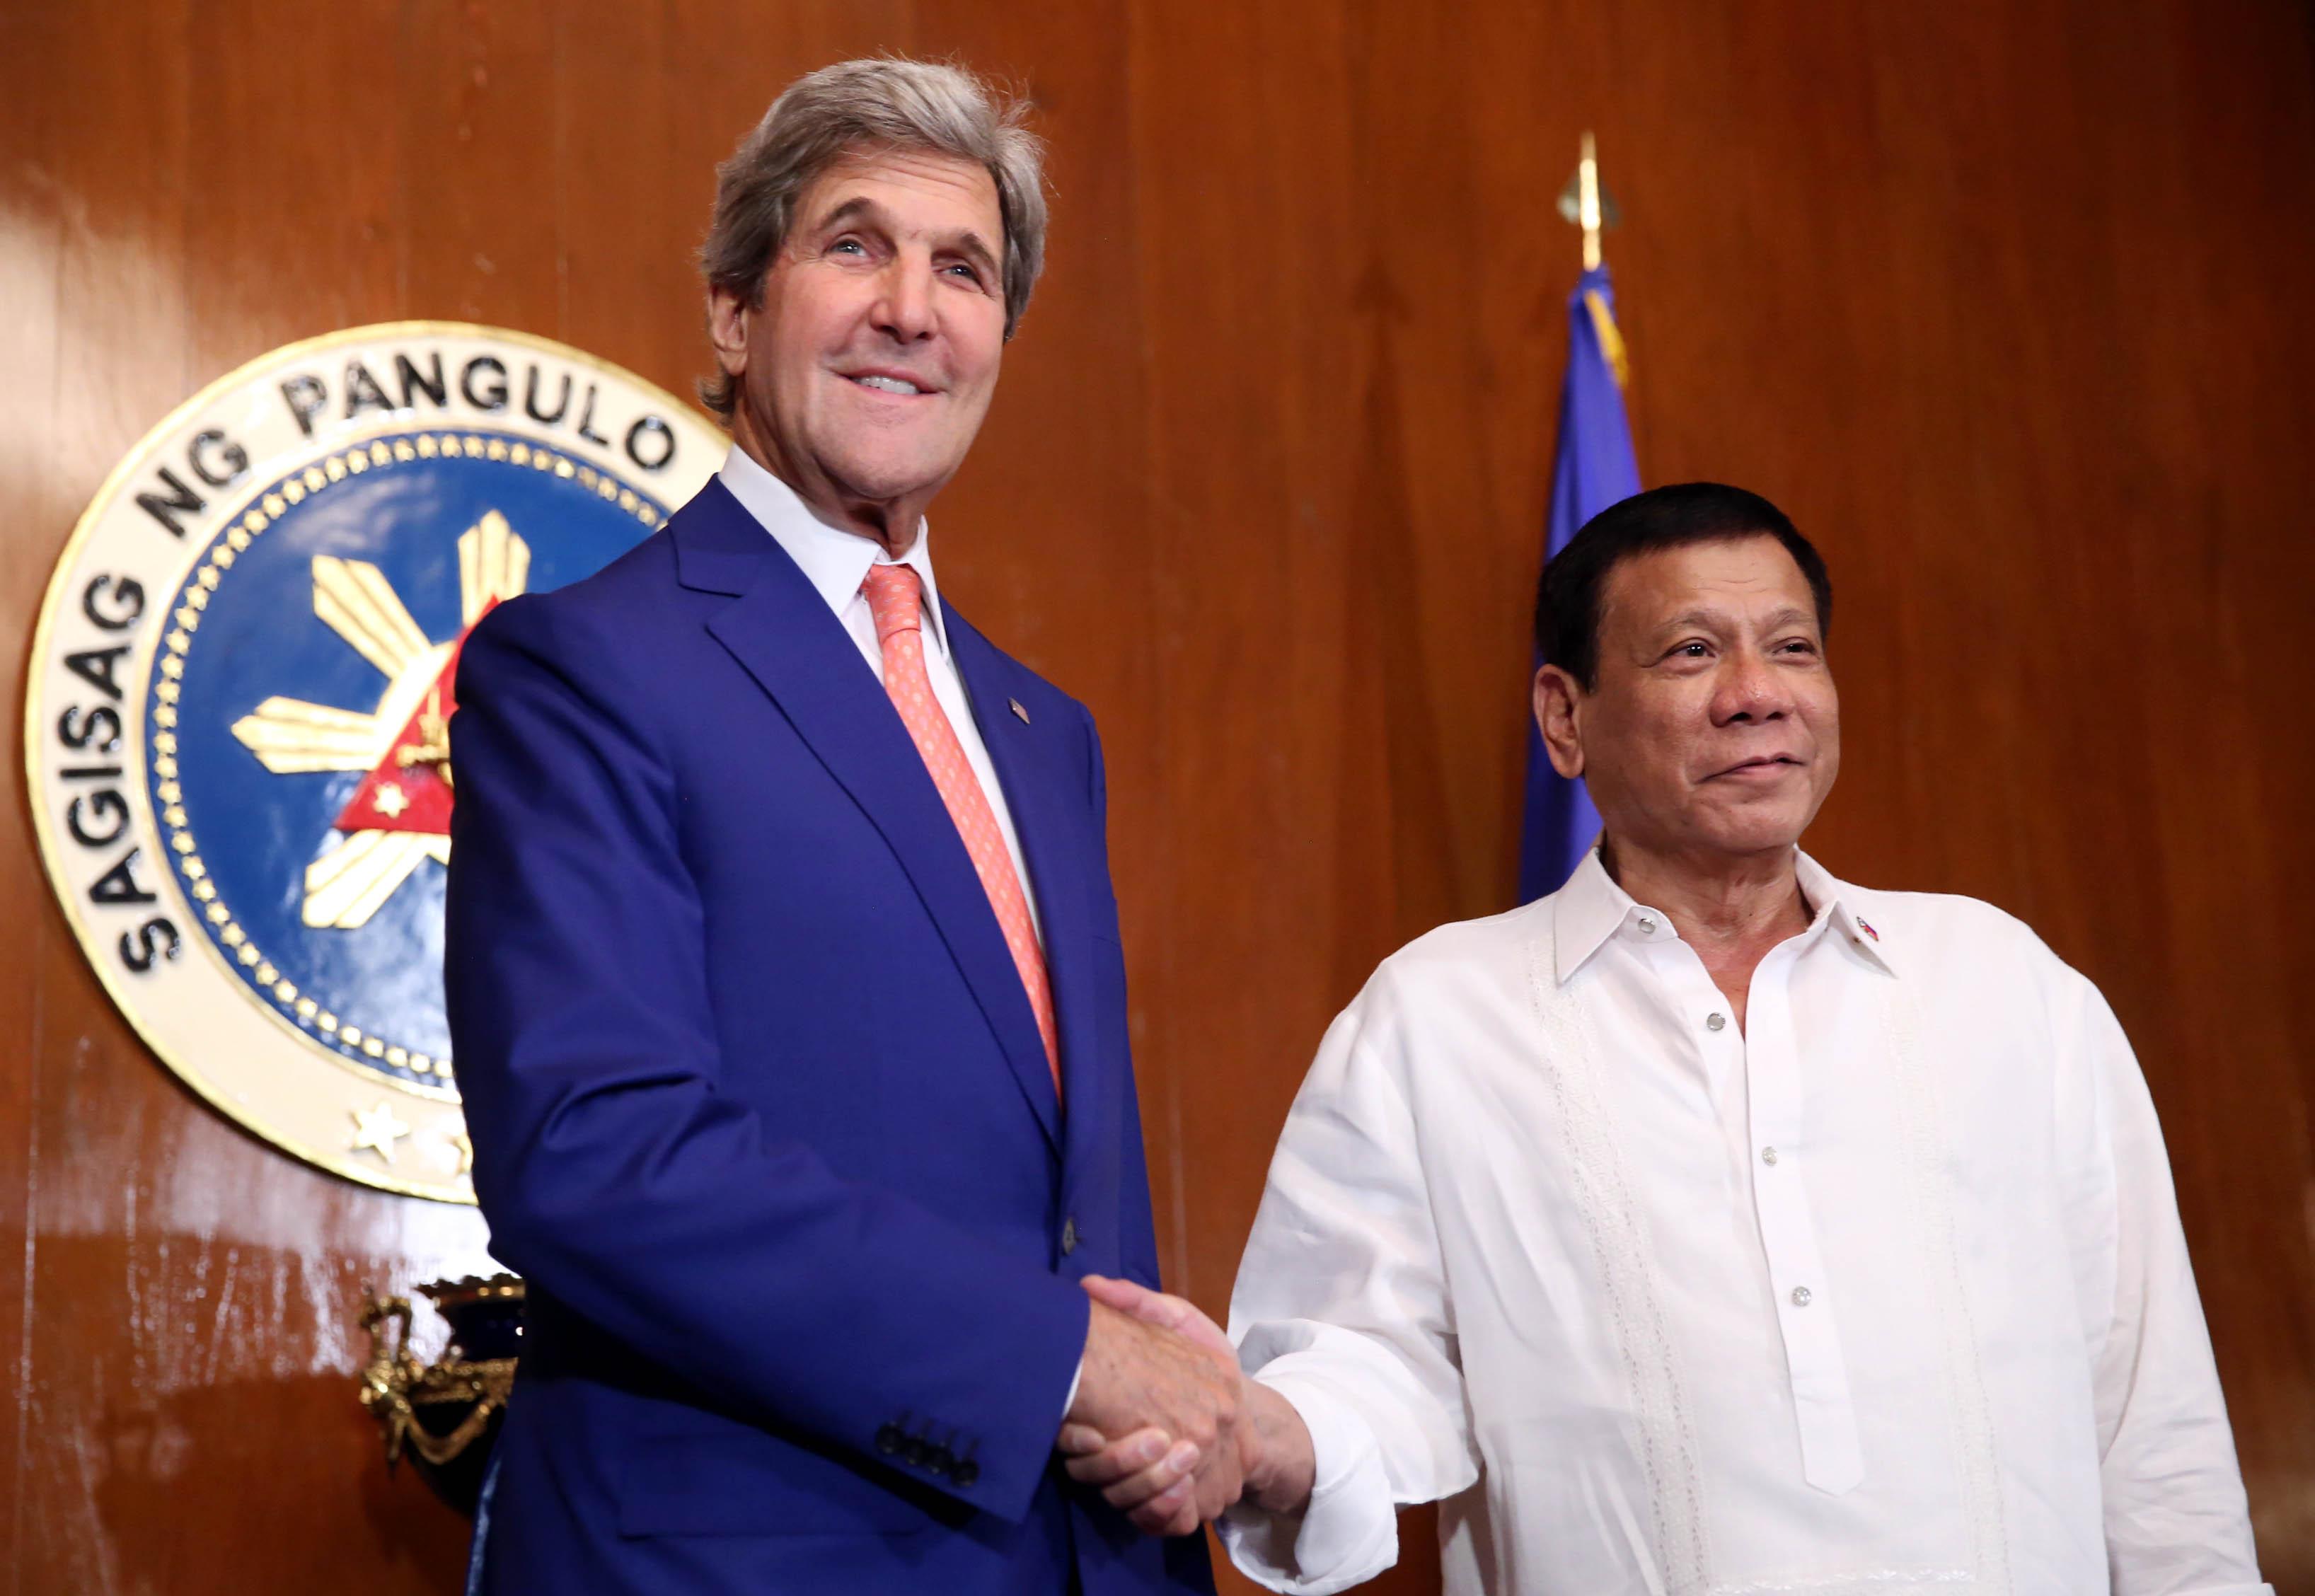 FILE: U.S. Secretary of State John Kerry (left) and President Rodrigo Duterte (right) at the President's Hall of Malacanang. (PNA photo)